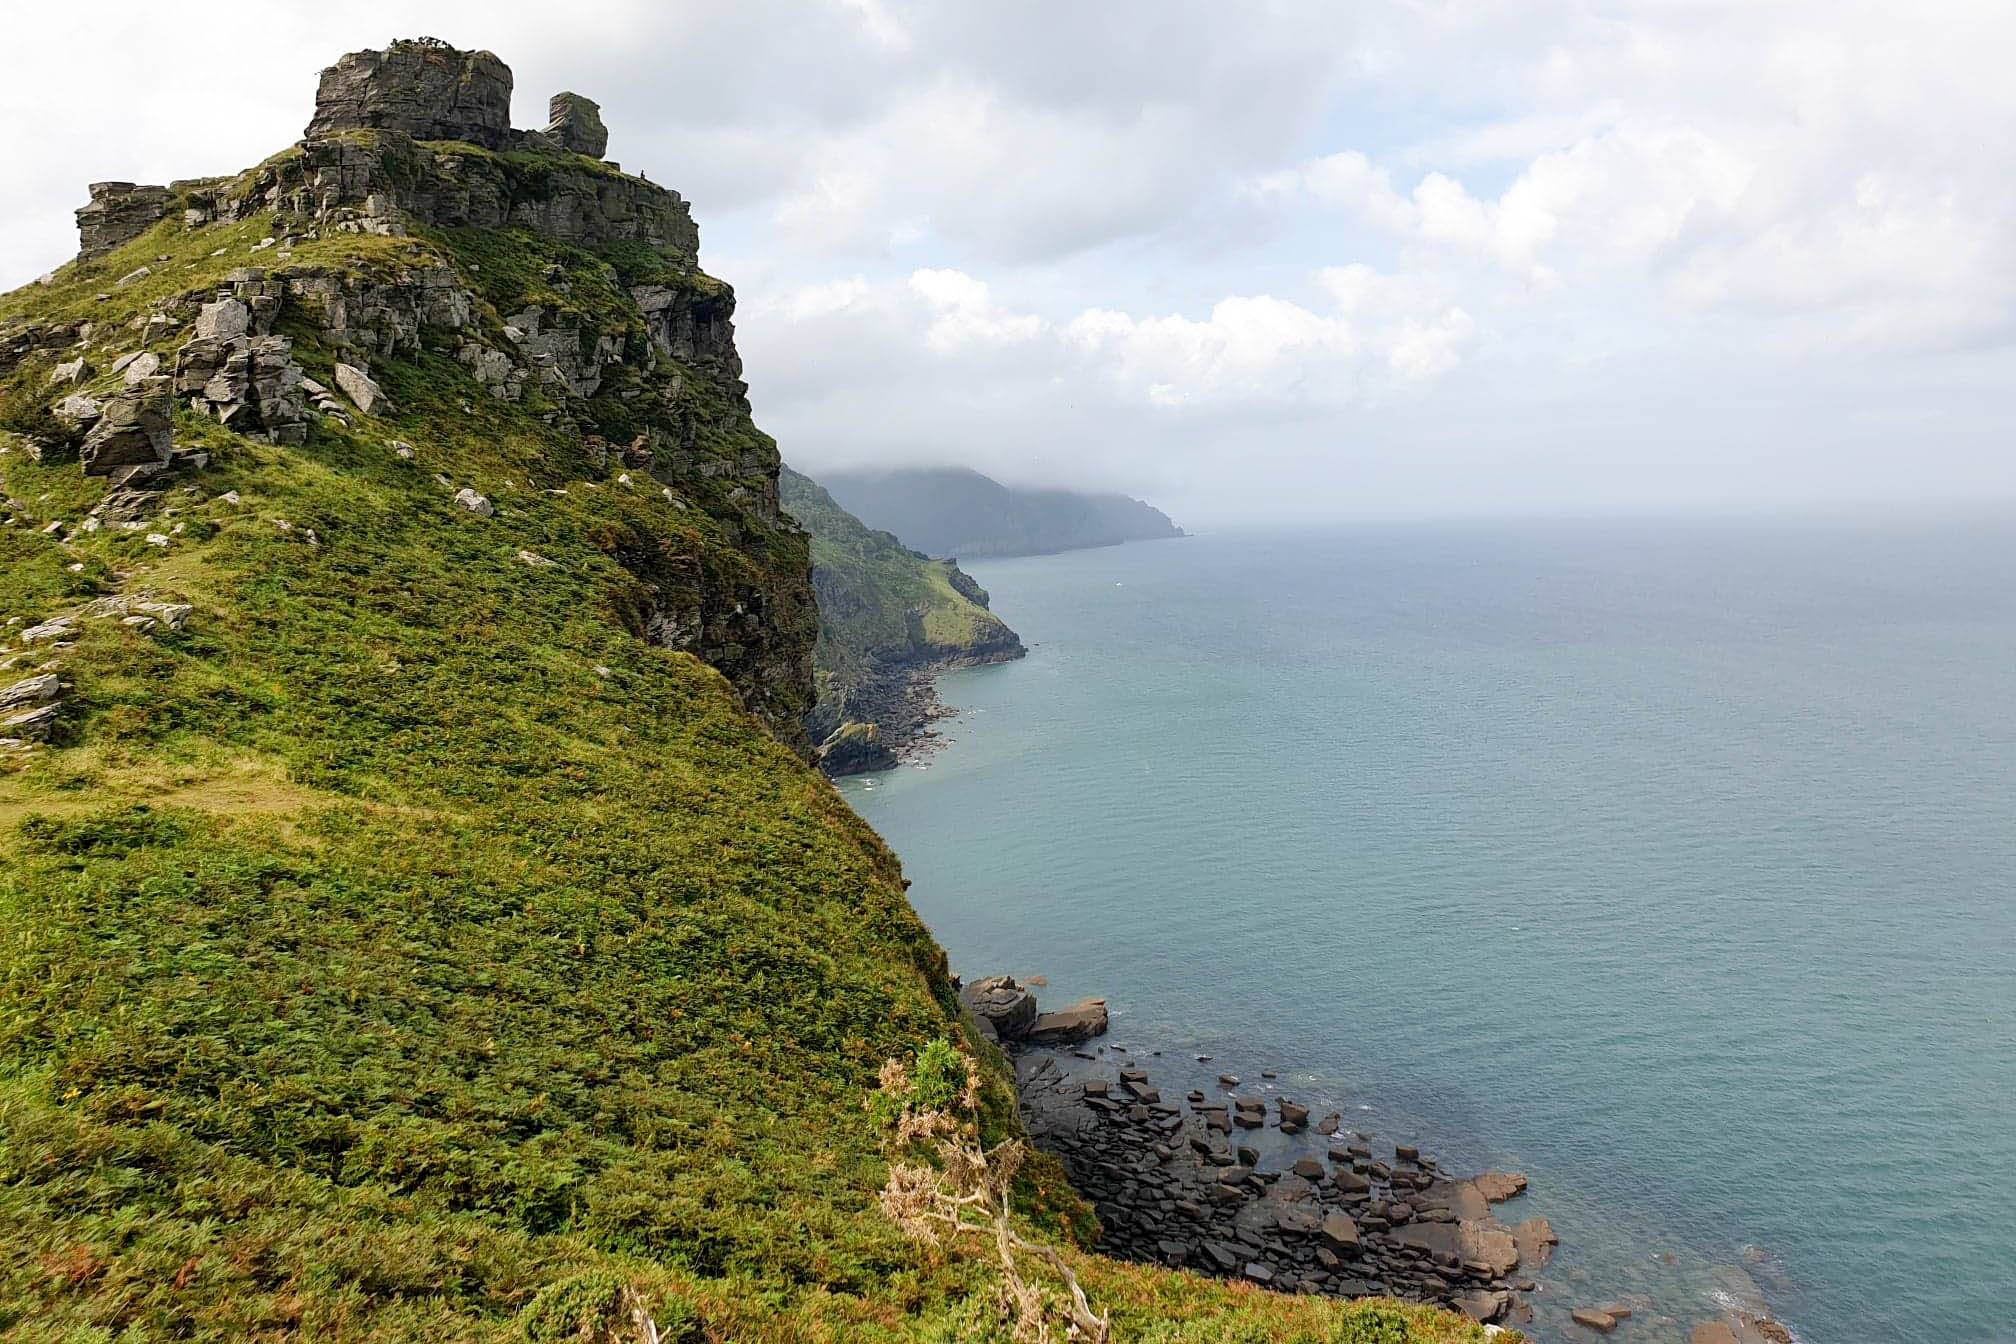 Valley of Rocks near Lynton in North Devon